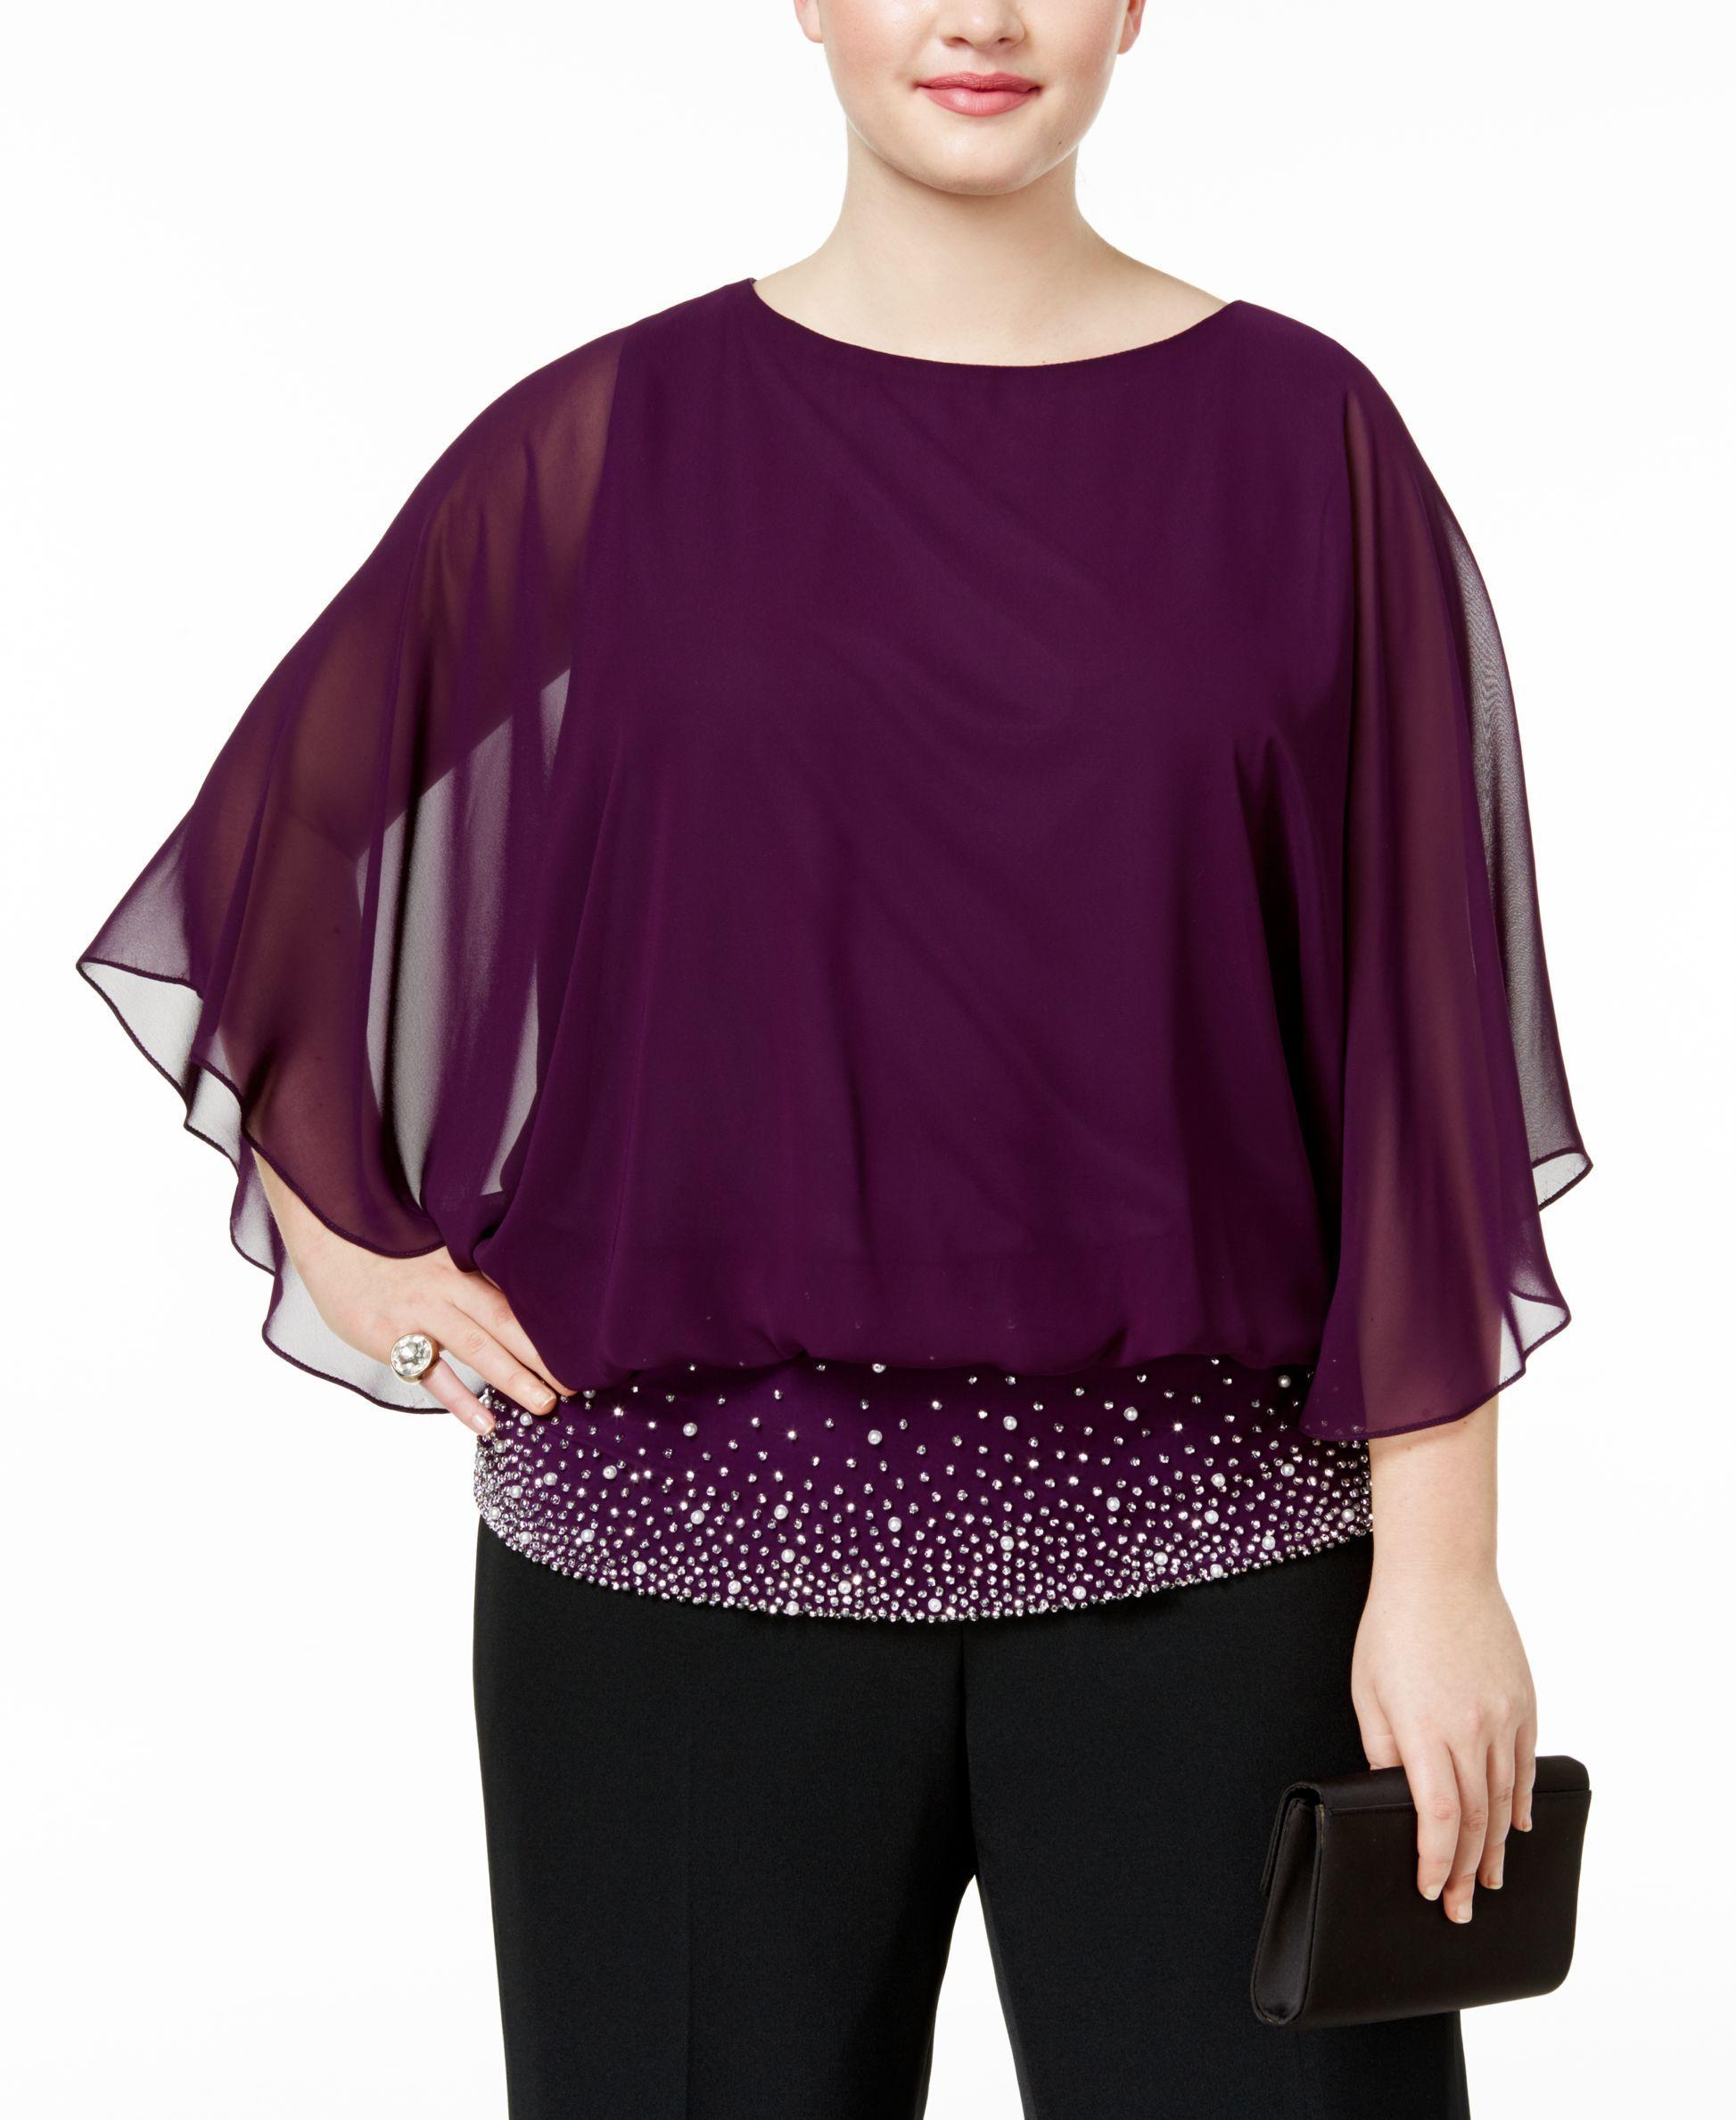 566f5d37b20 Msk Plus Size Embellished Chiffon Blouse